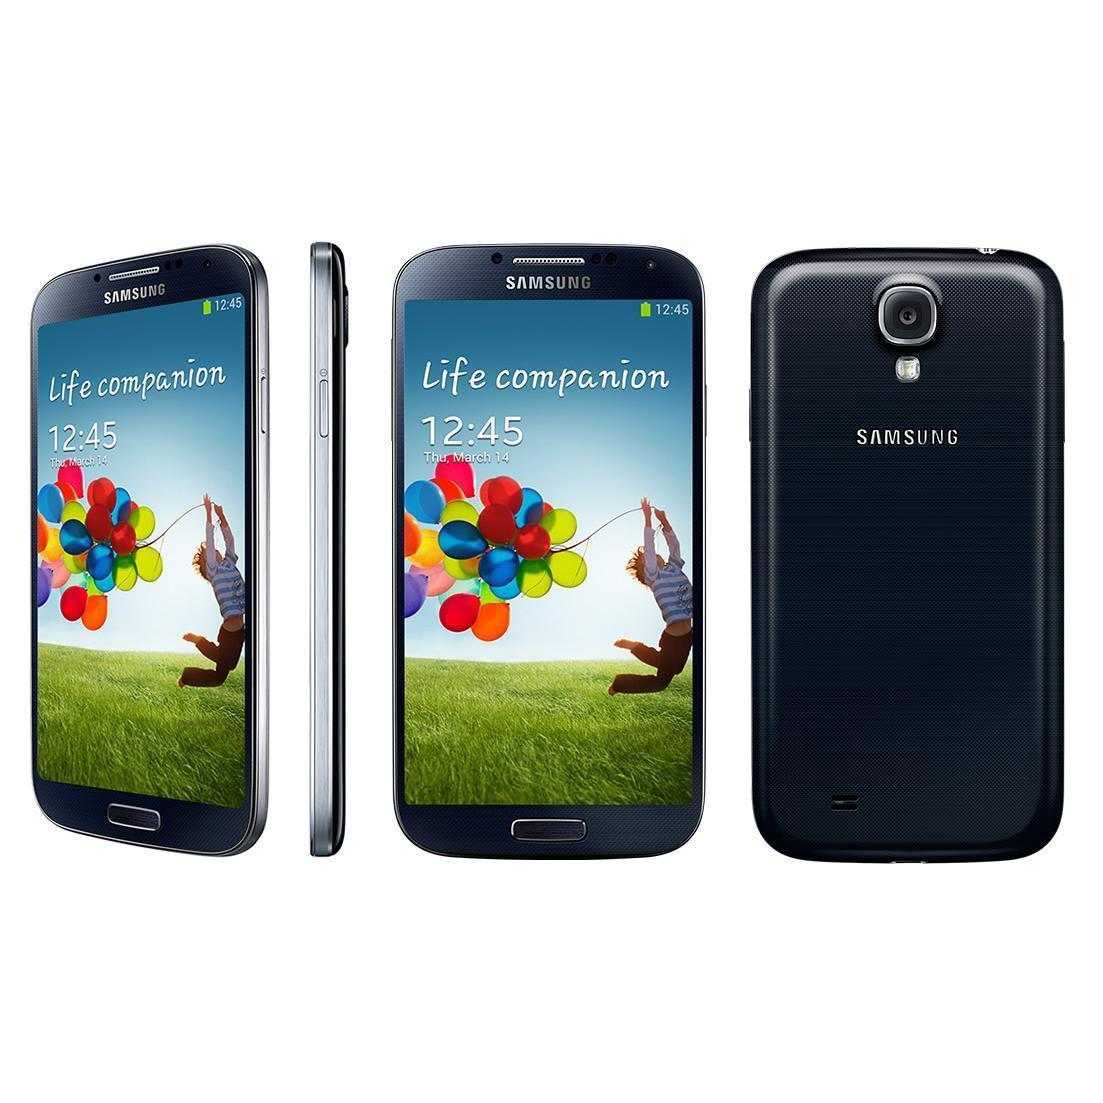 Samsung Galaxy S4 16 Go i9505 4G - Noir - Bouygues